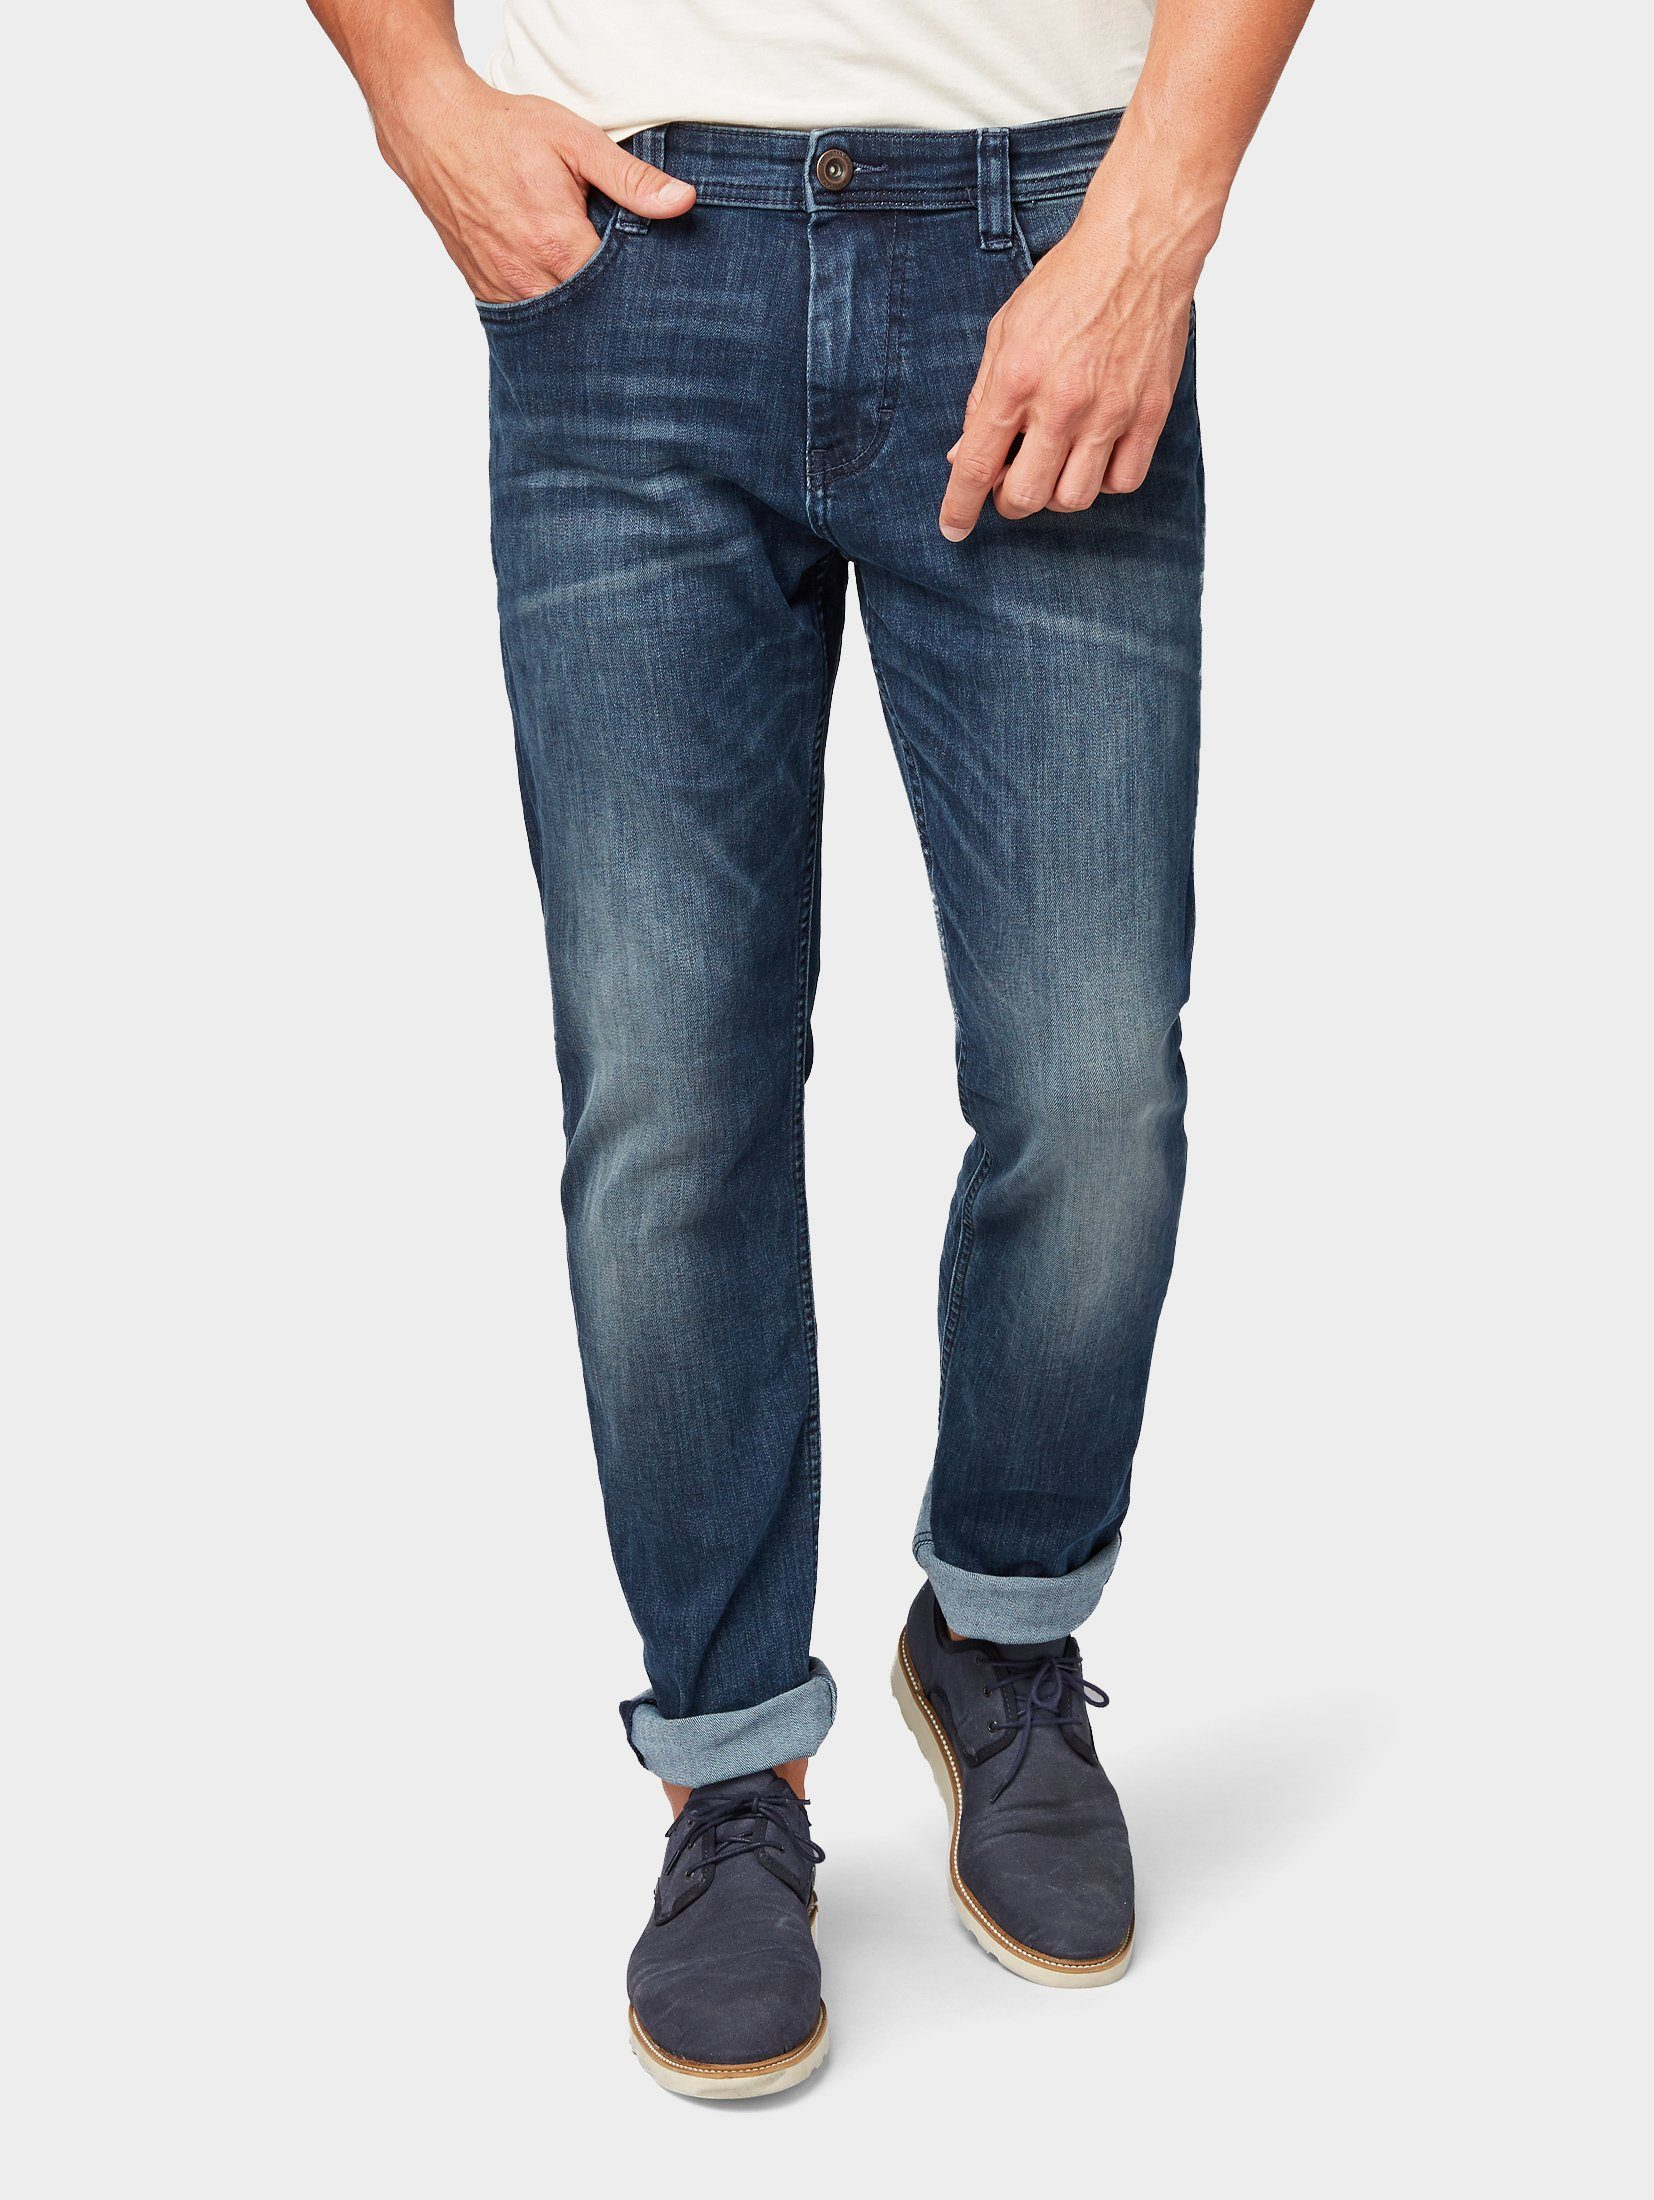 TOM TAILOR 5-Pocket-Jeans »Marvin Straight Jeans«